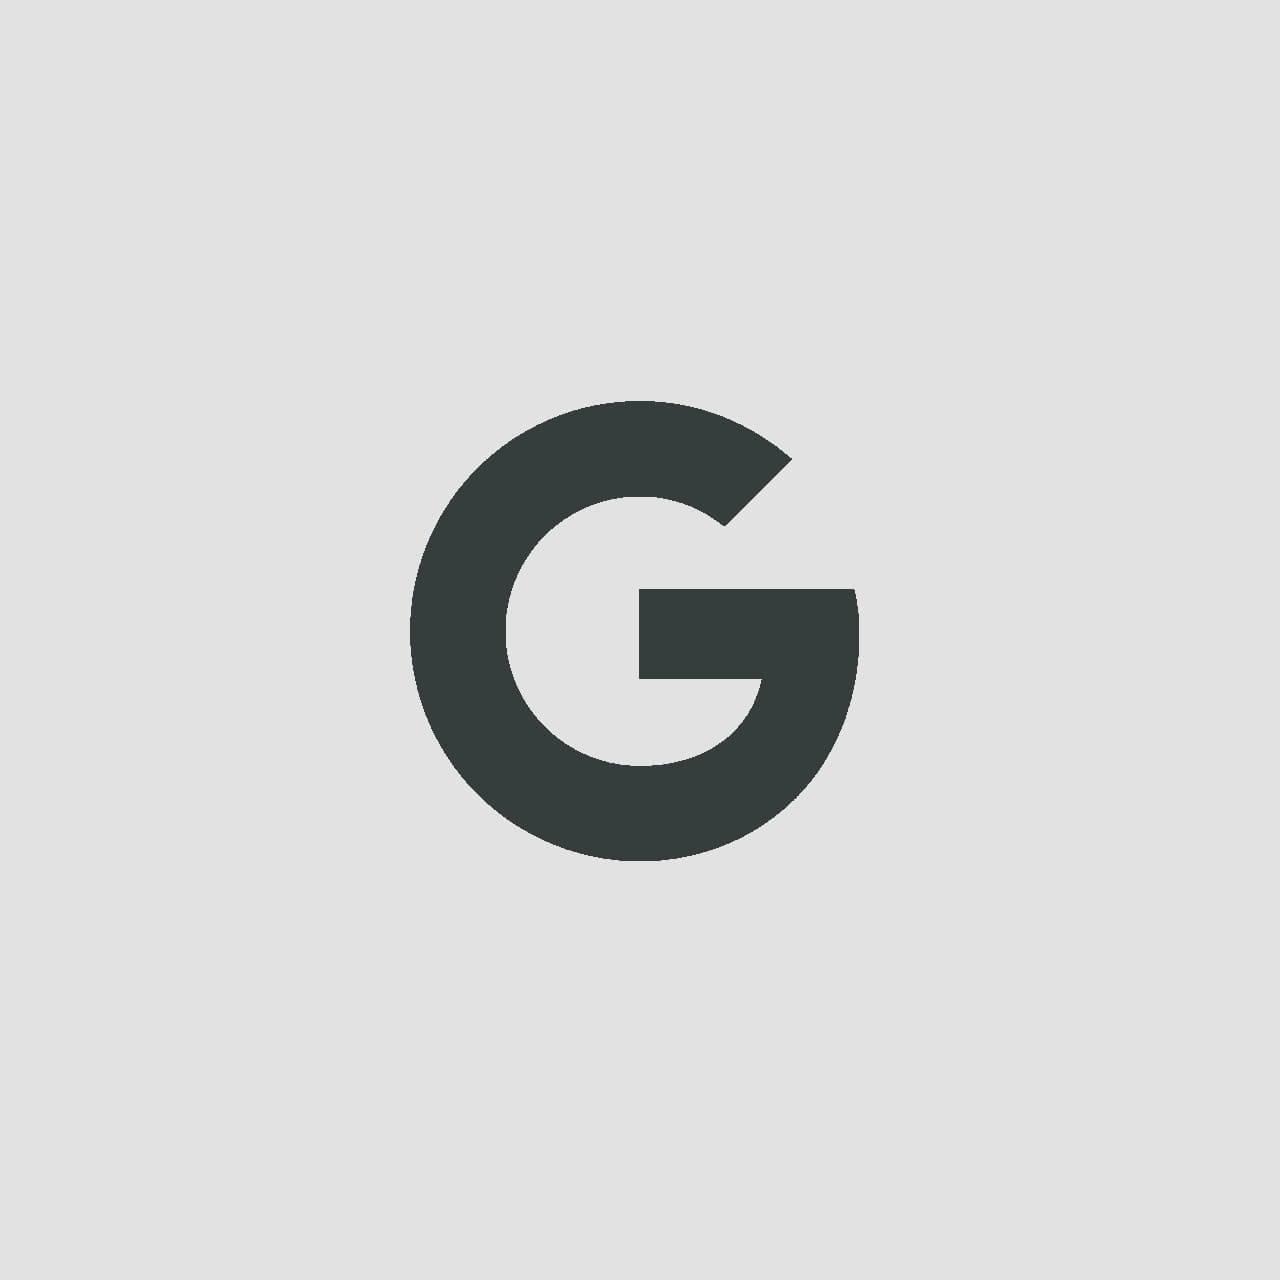 Google Phone Skins